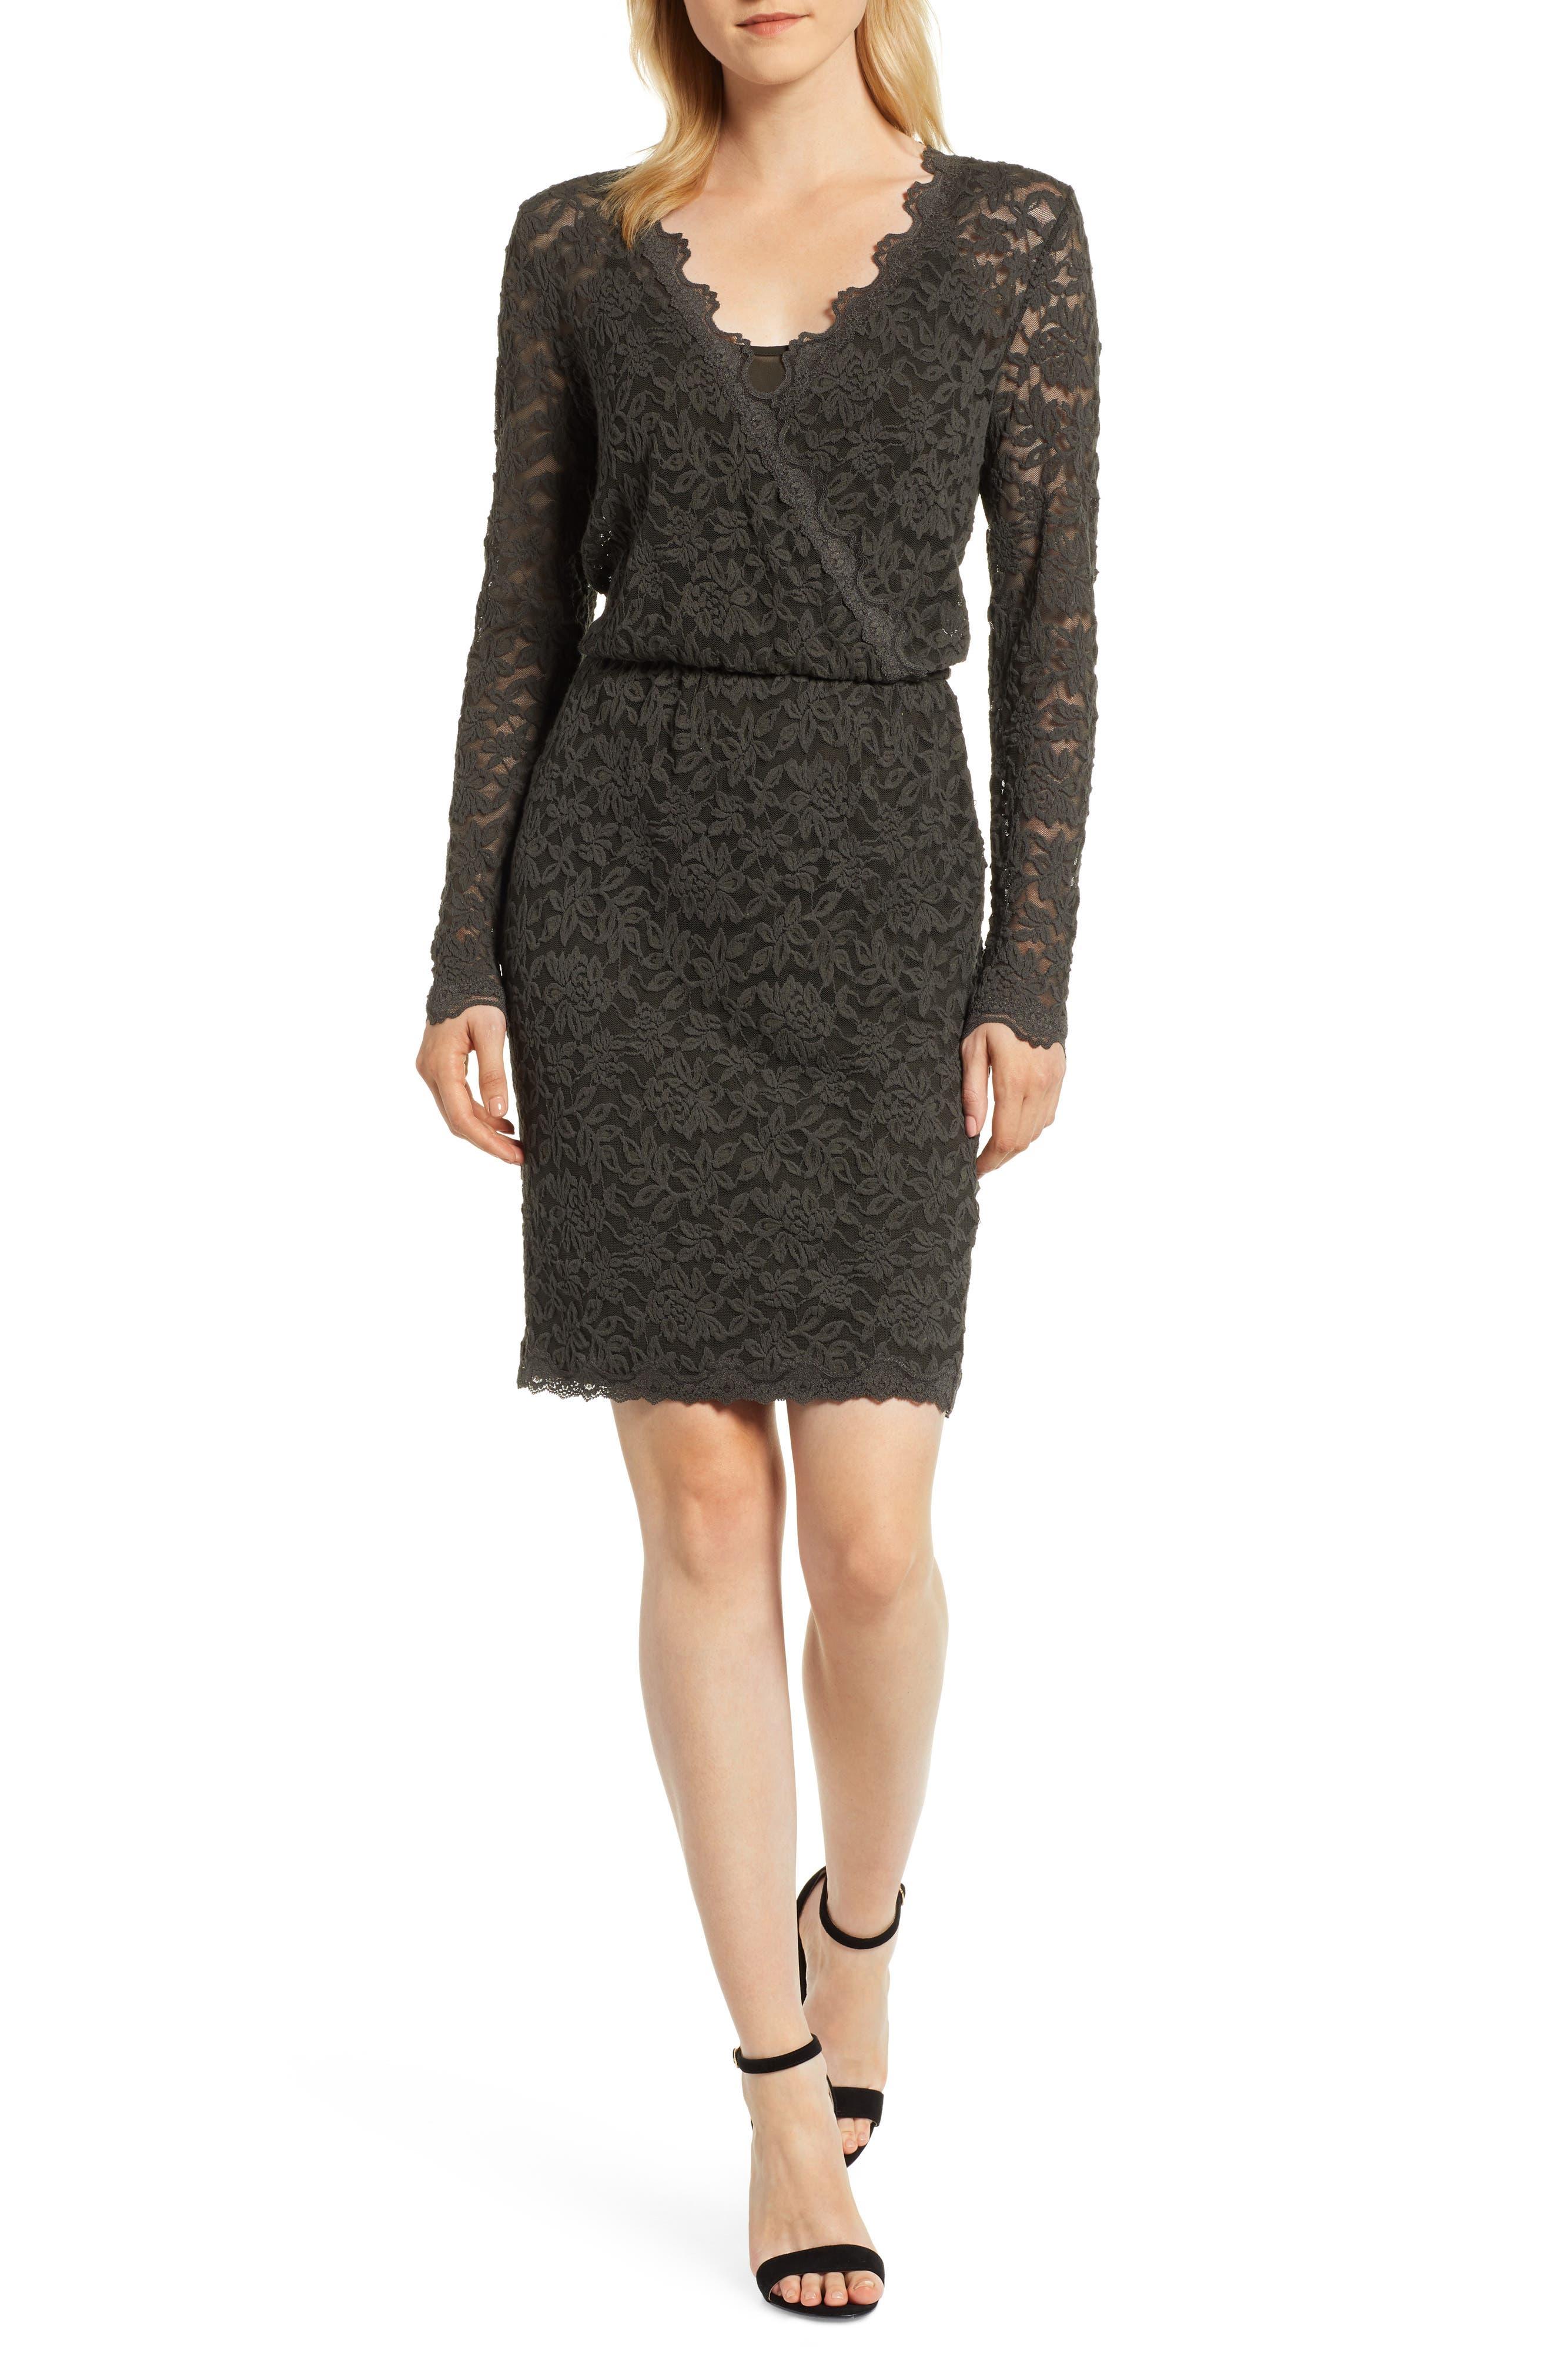 ROSEMUNDE, Delicia Scallop Detail Cotton Blend Lace Dress, Main thumbnail 1, color, DARK FOREST